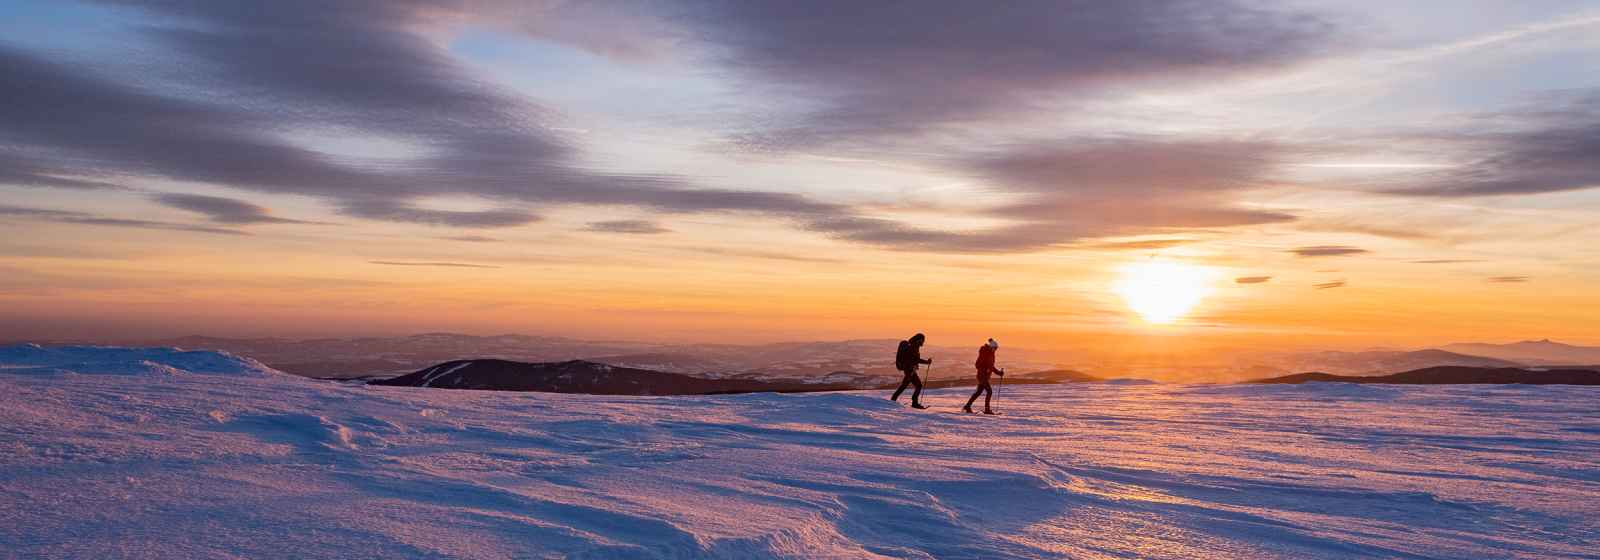 Schneeschuhtour Hochwiesenberg, Riesengebirge, Tschechien.